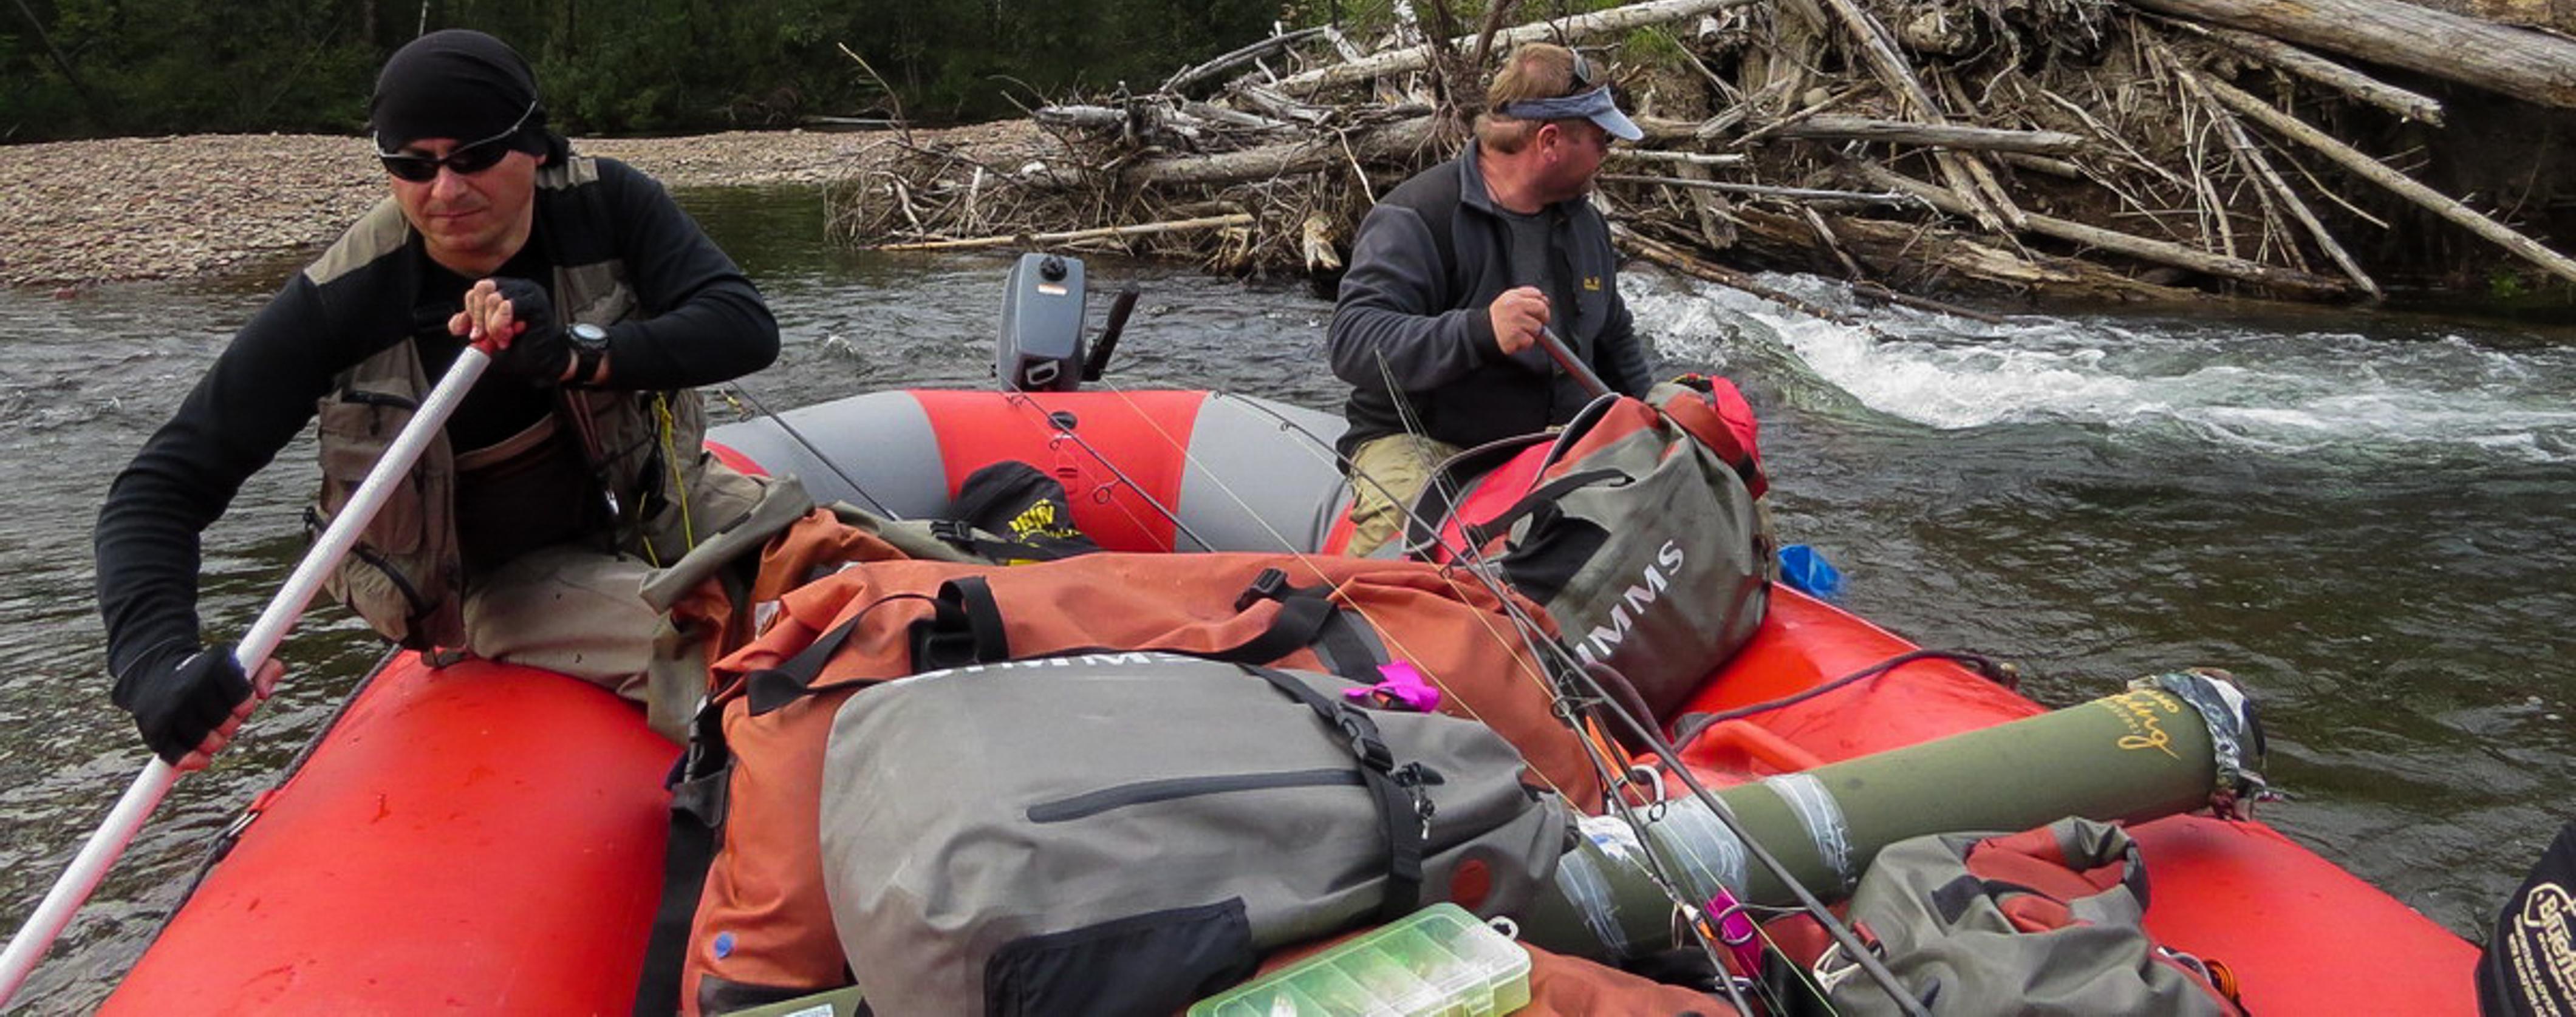 Маршрут выходного дня со сплавом по реке Хор